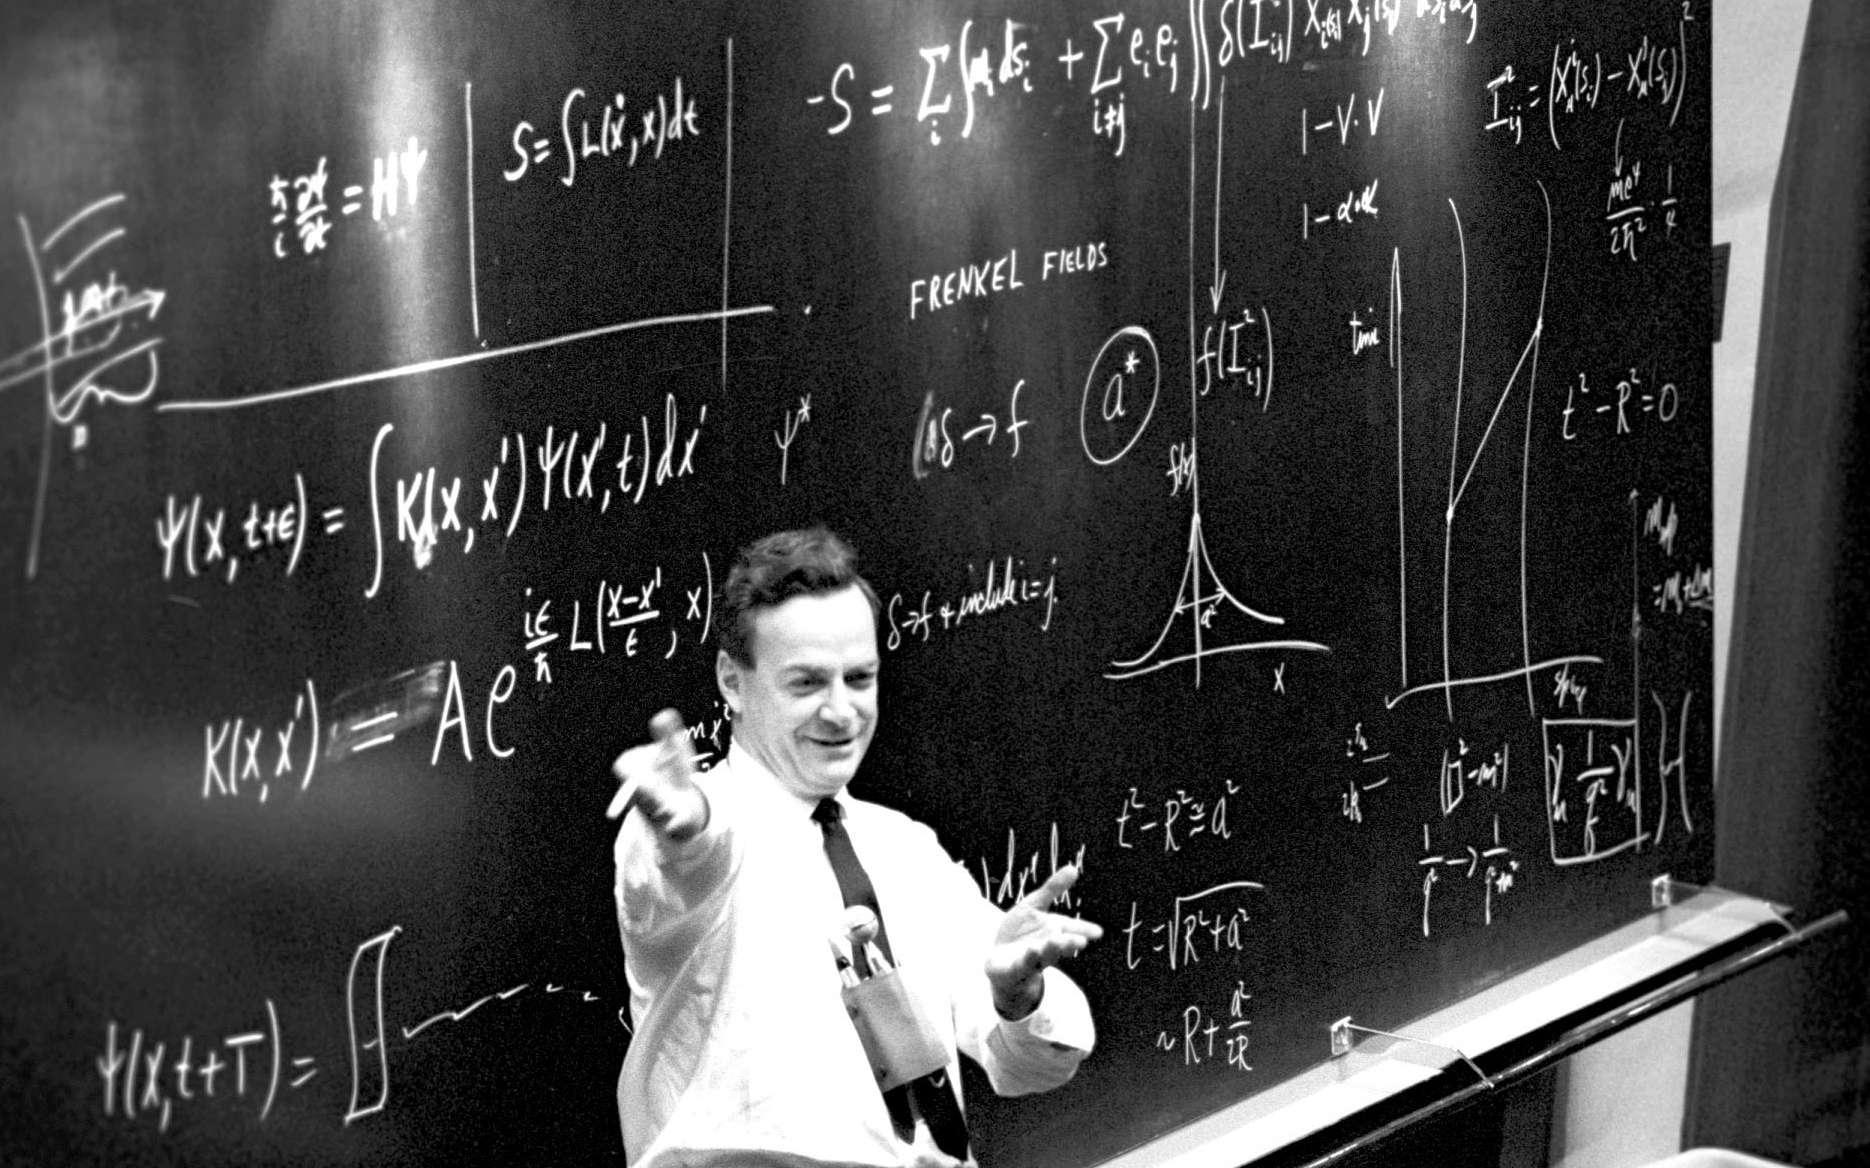 Richard Feynman en visite au Cern en 1965. © Cern